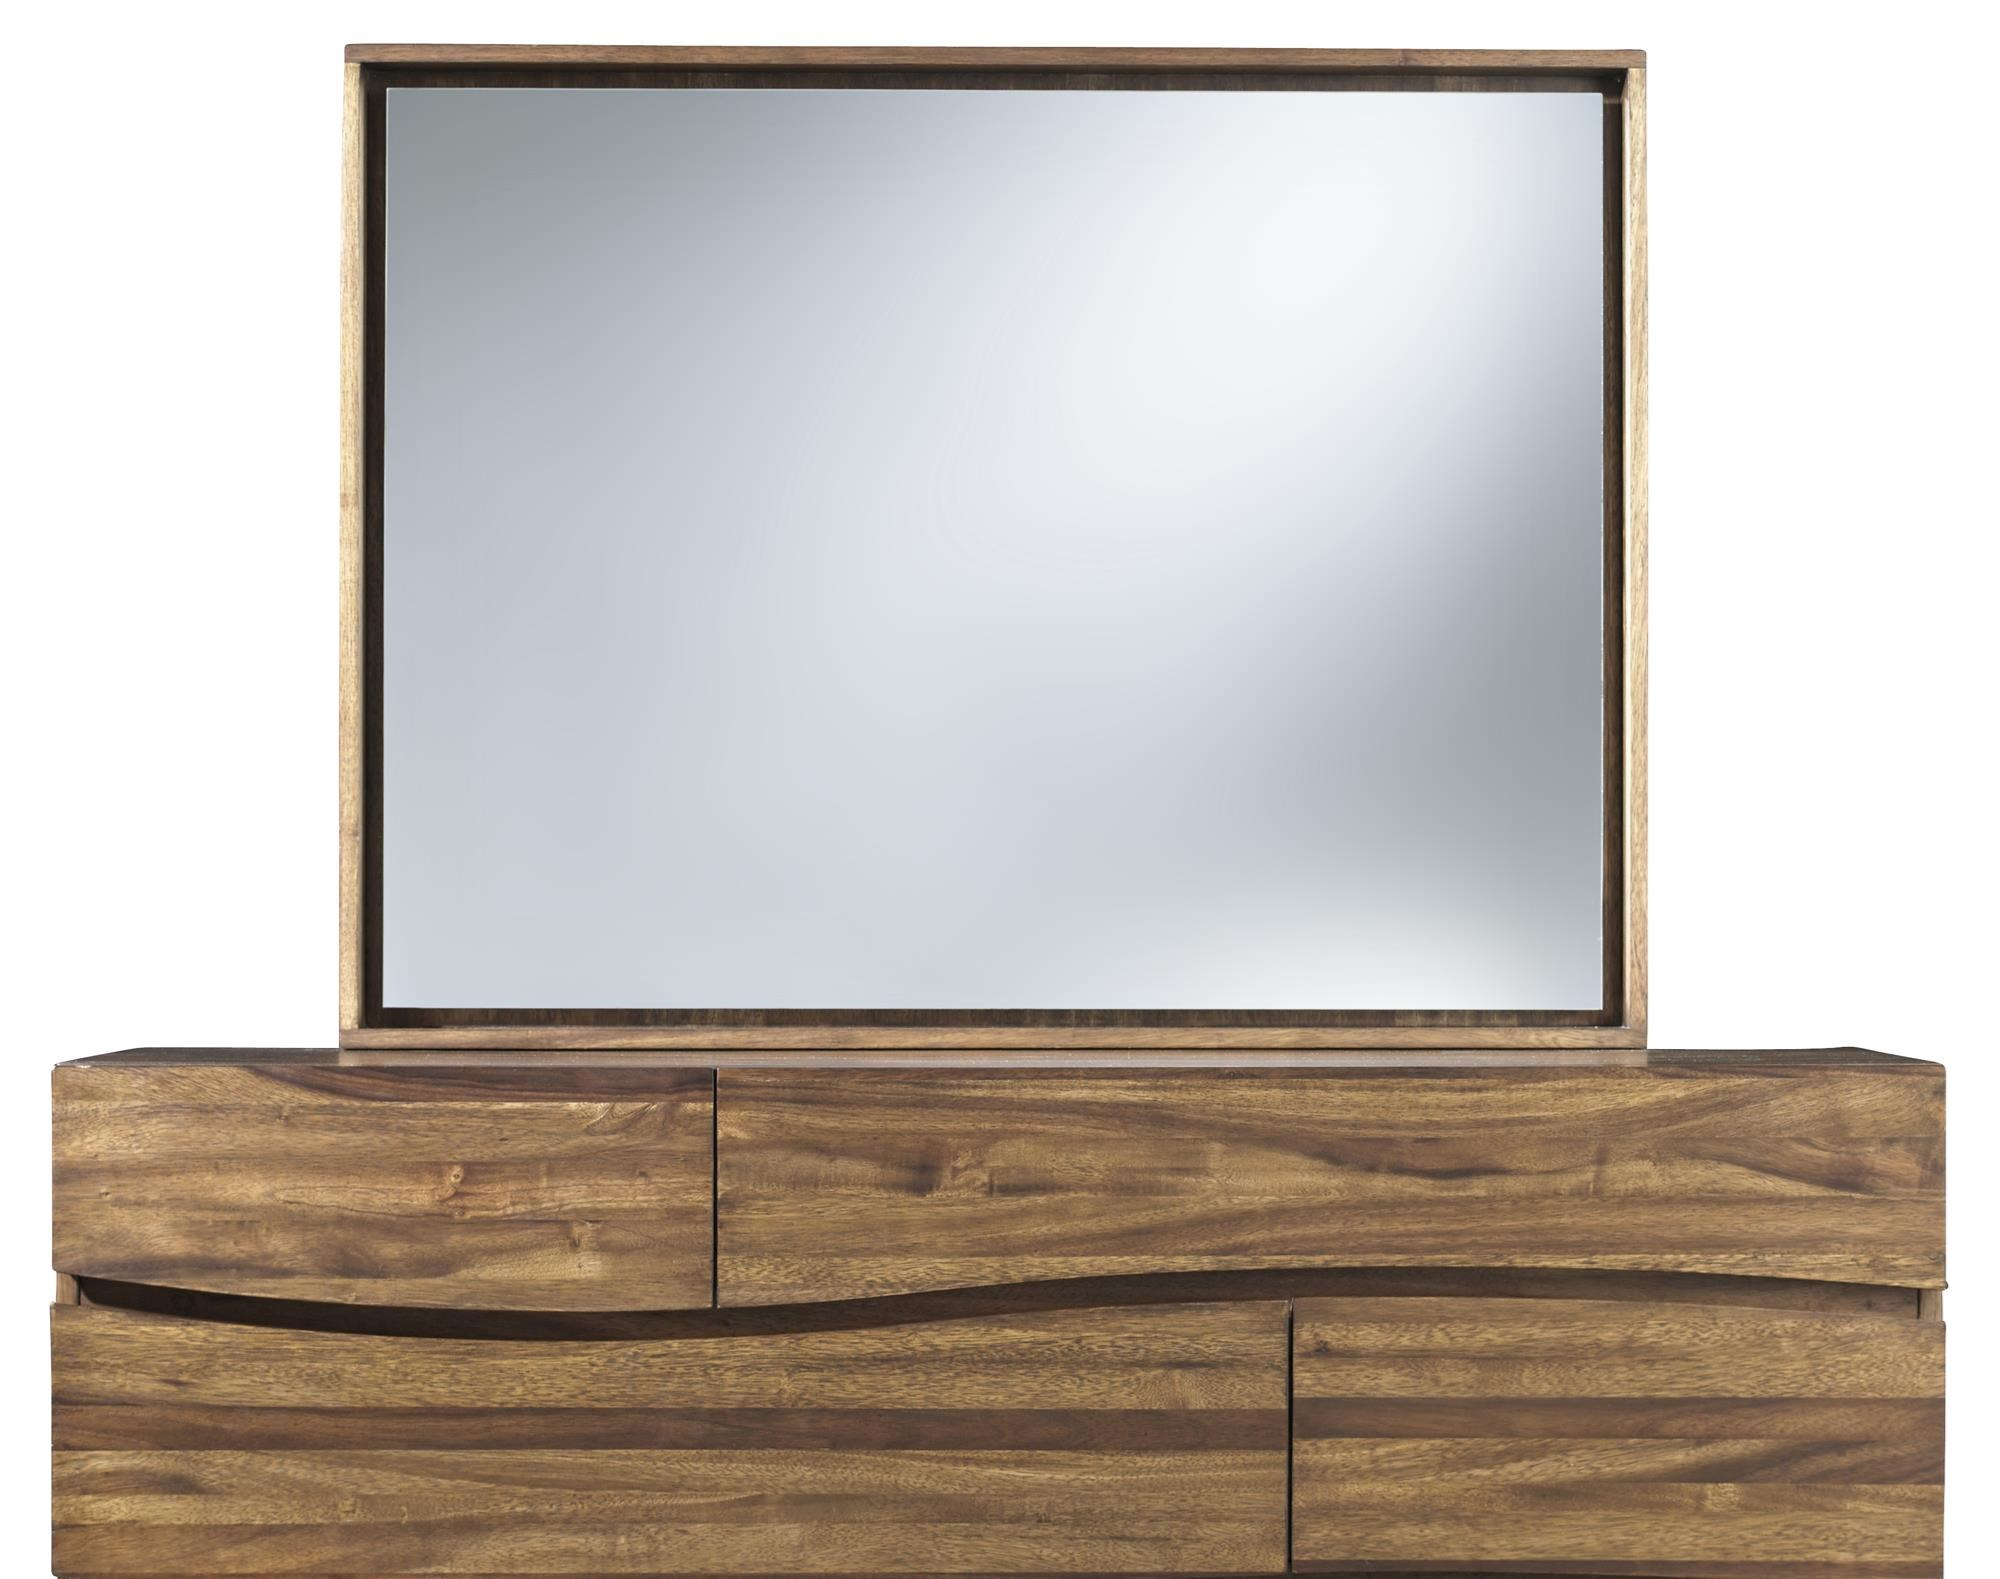 Modus International Ocean Mirror - Item Number: 8C-79-83 OCEAN